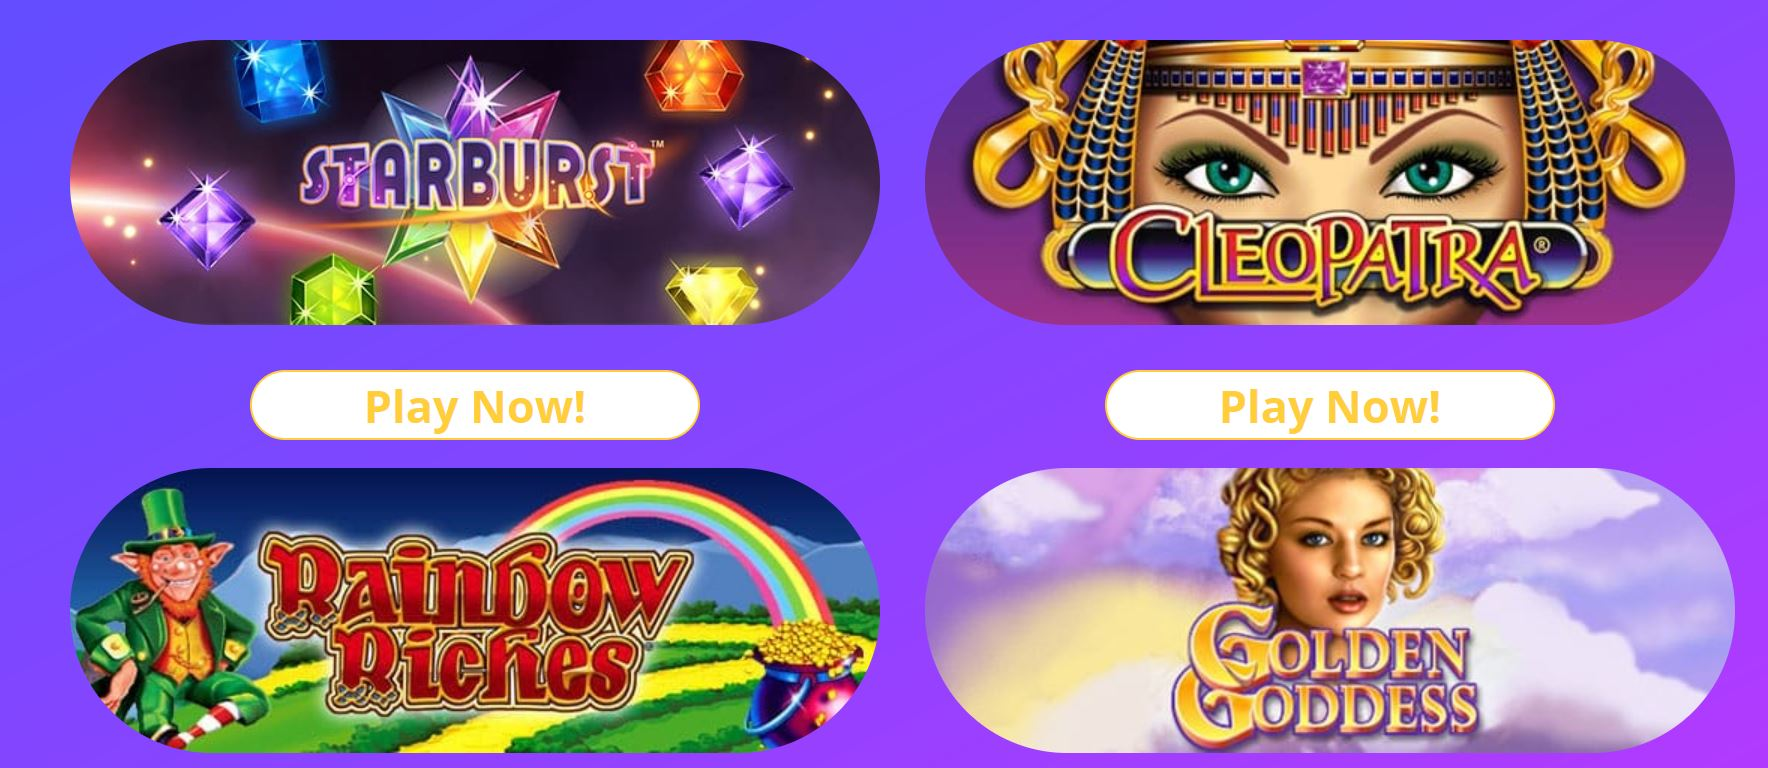 jackpot slot casino